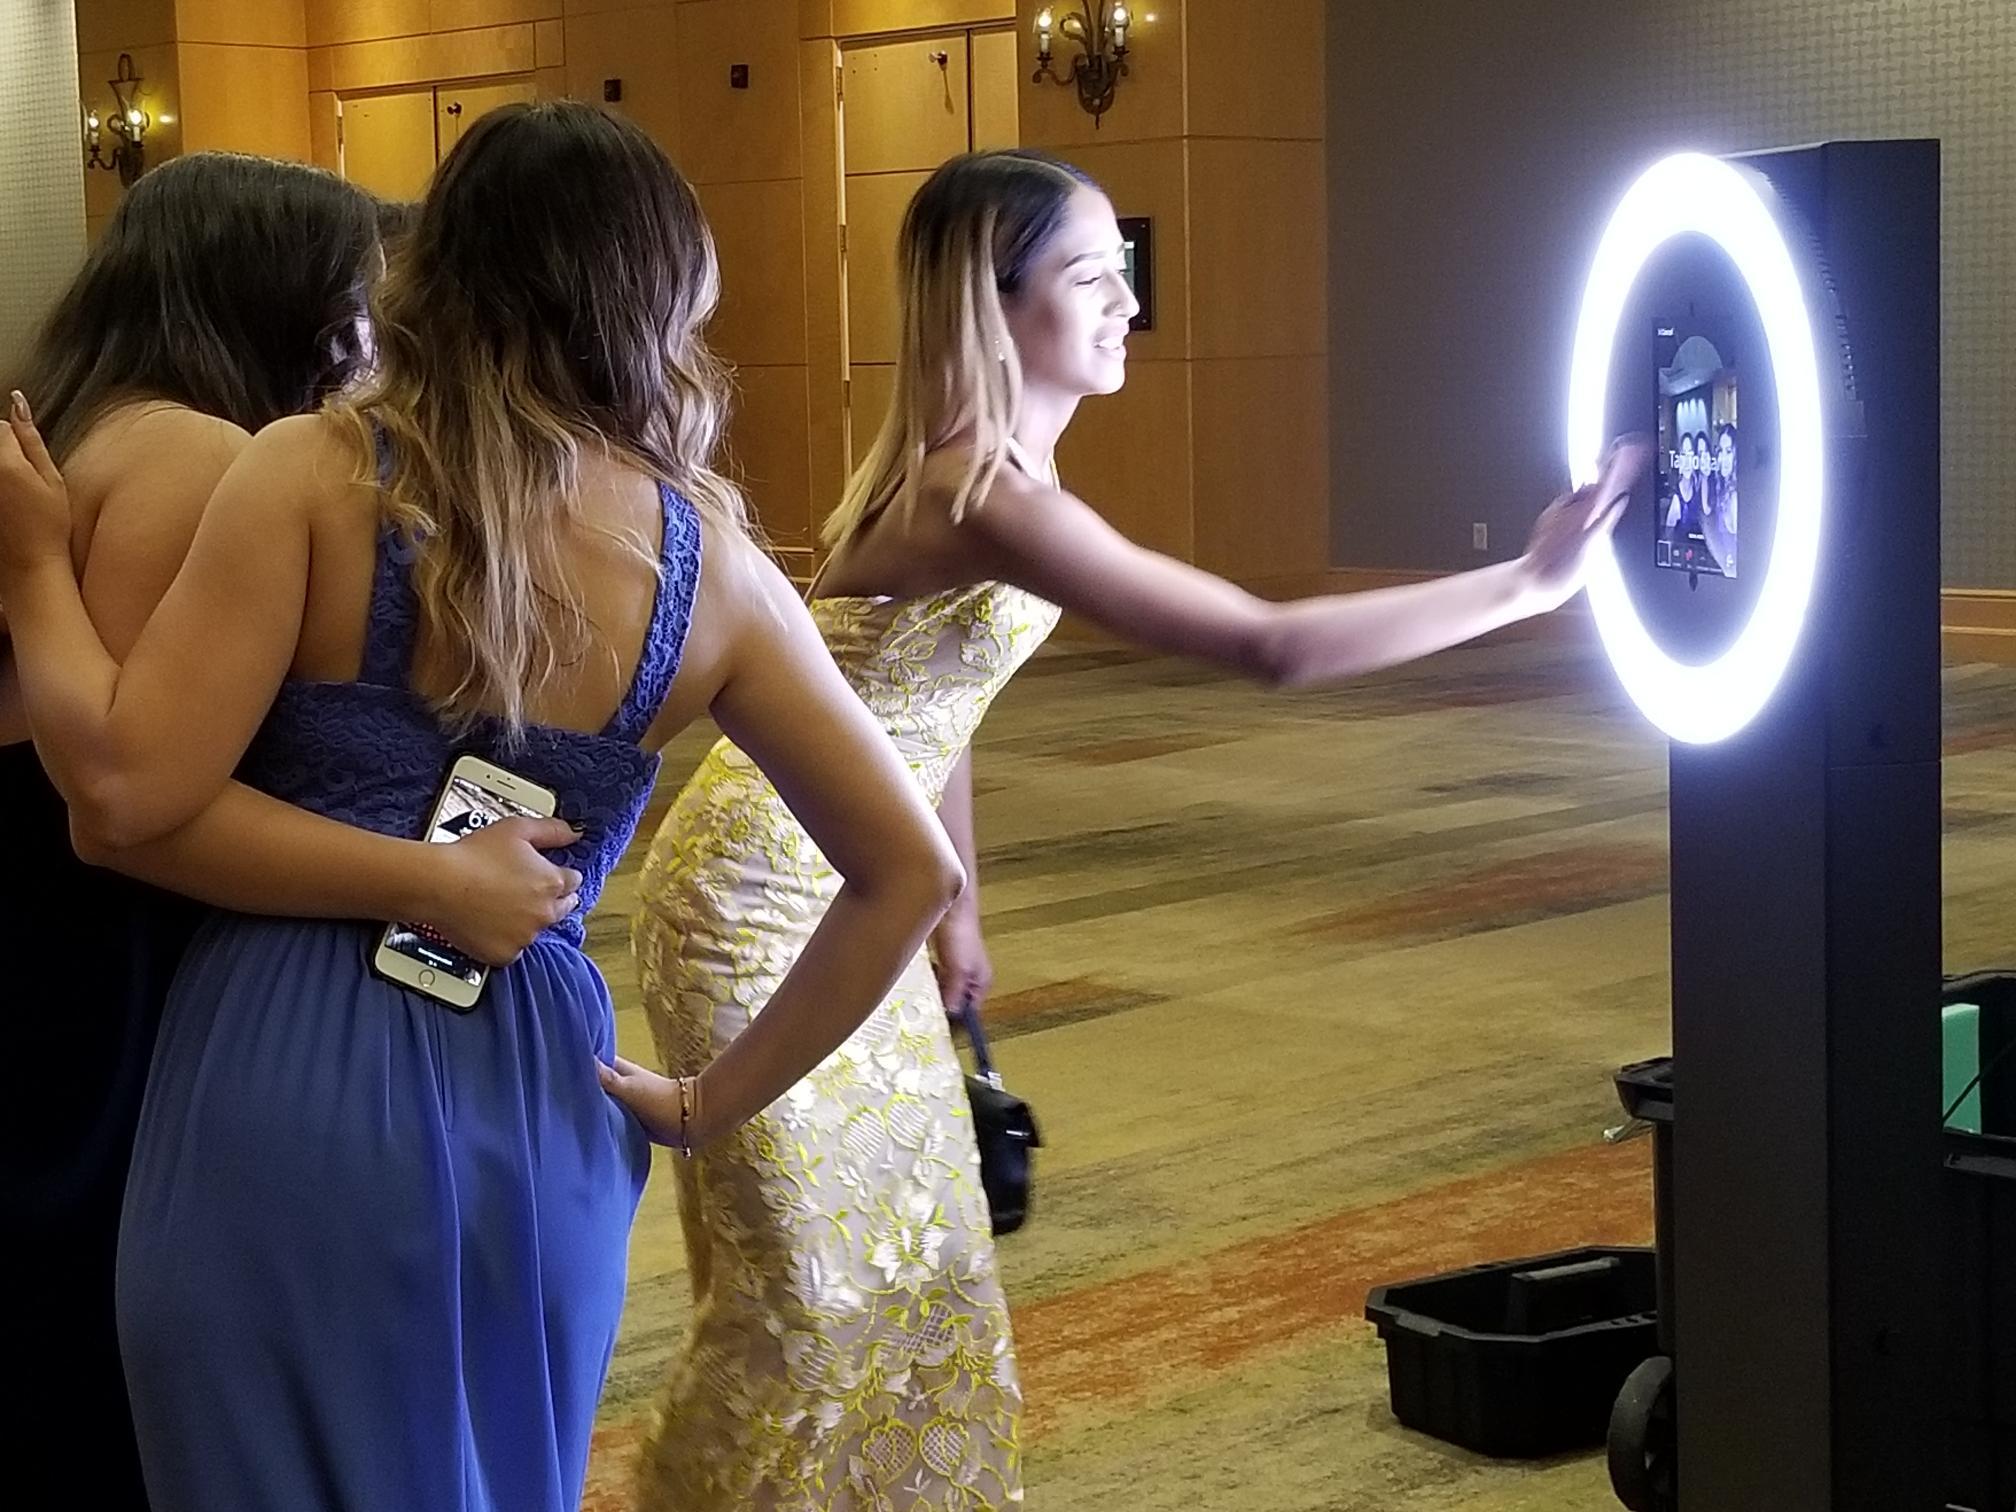 Selfie Shotz Digital Booth - Crazy Shotz Photo Booth